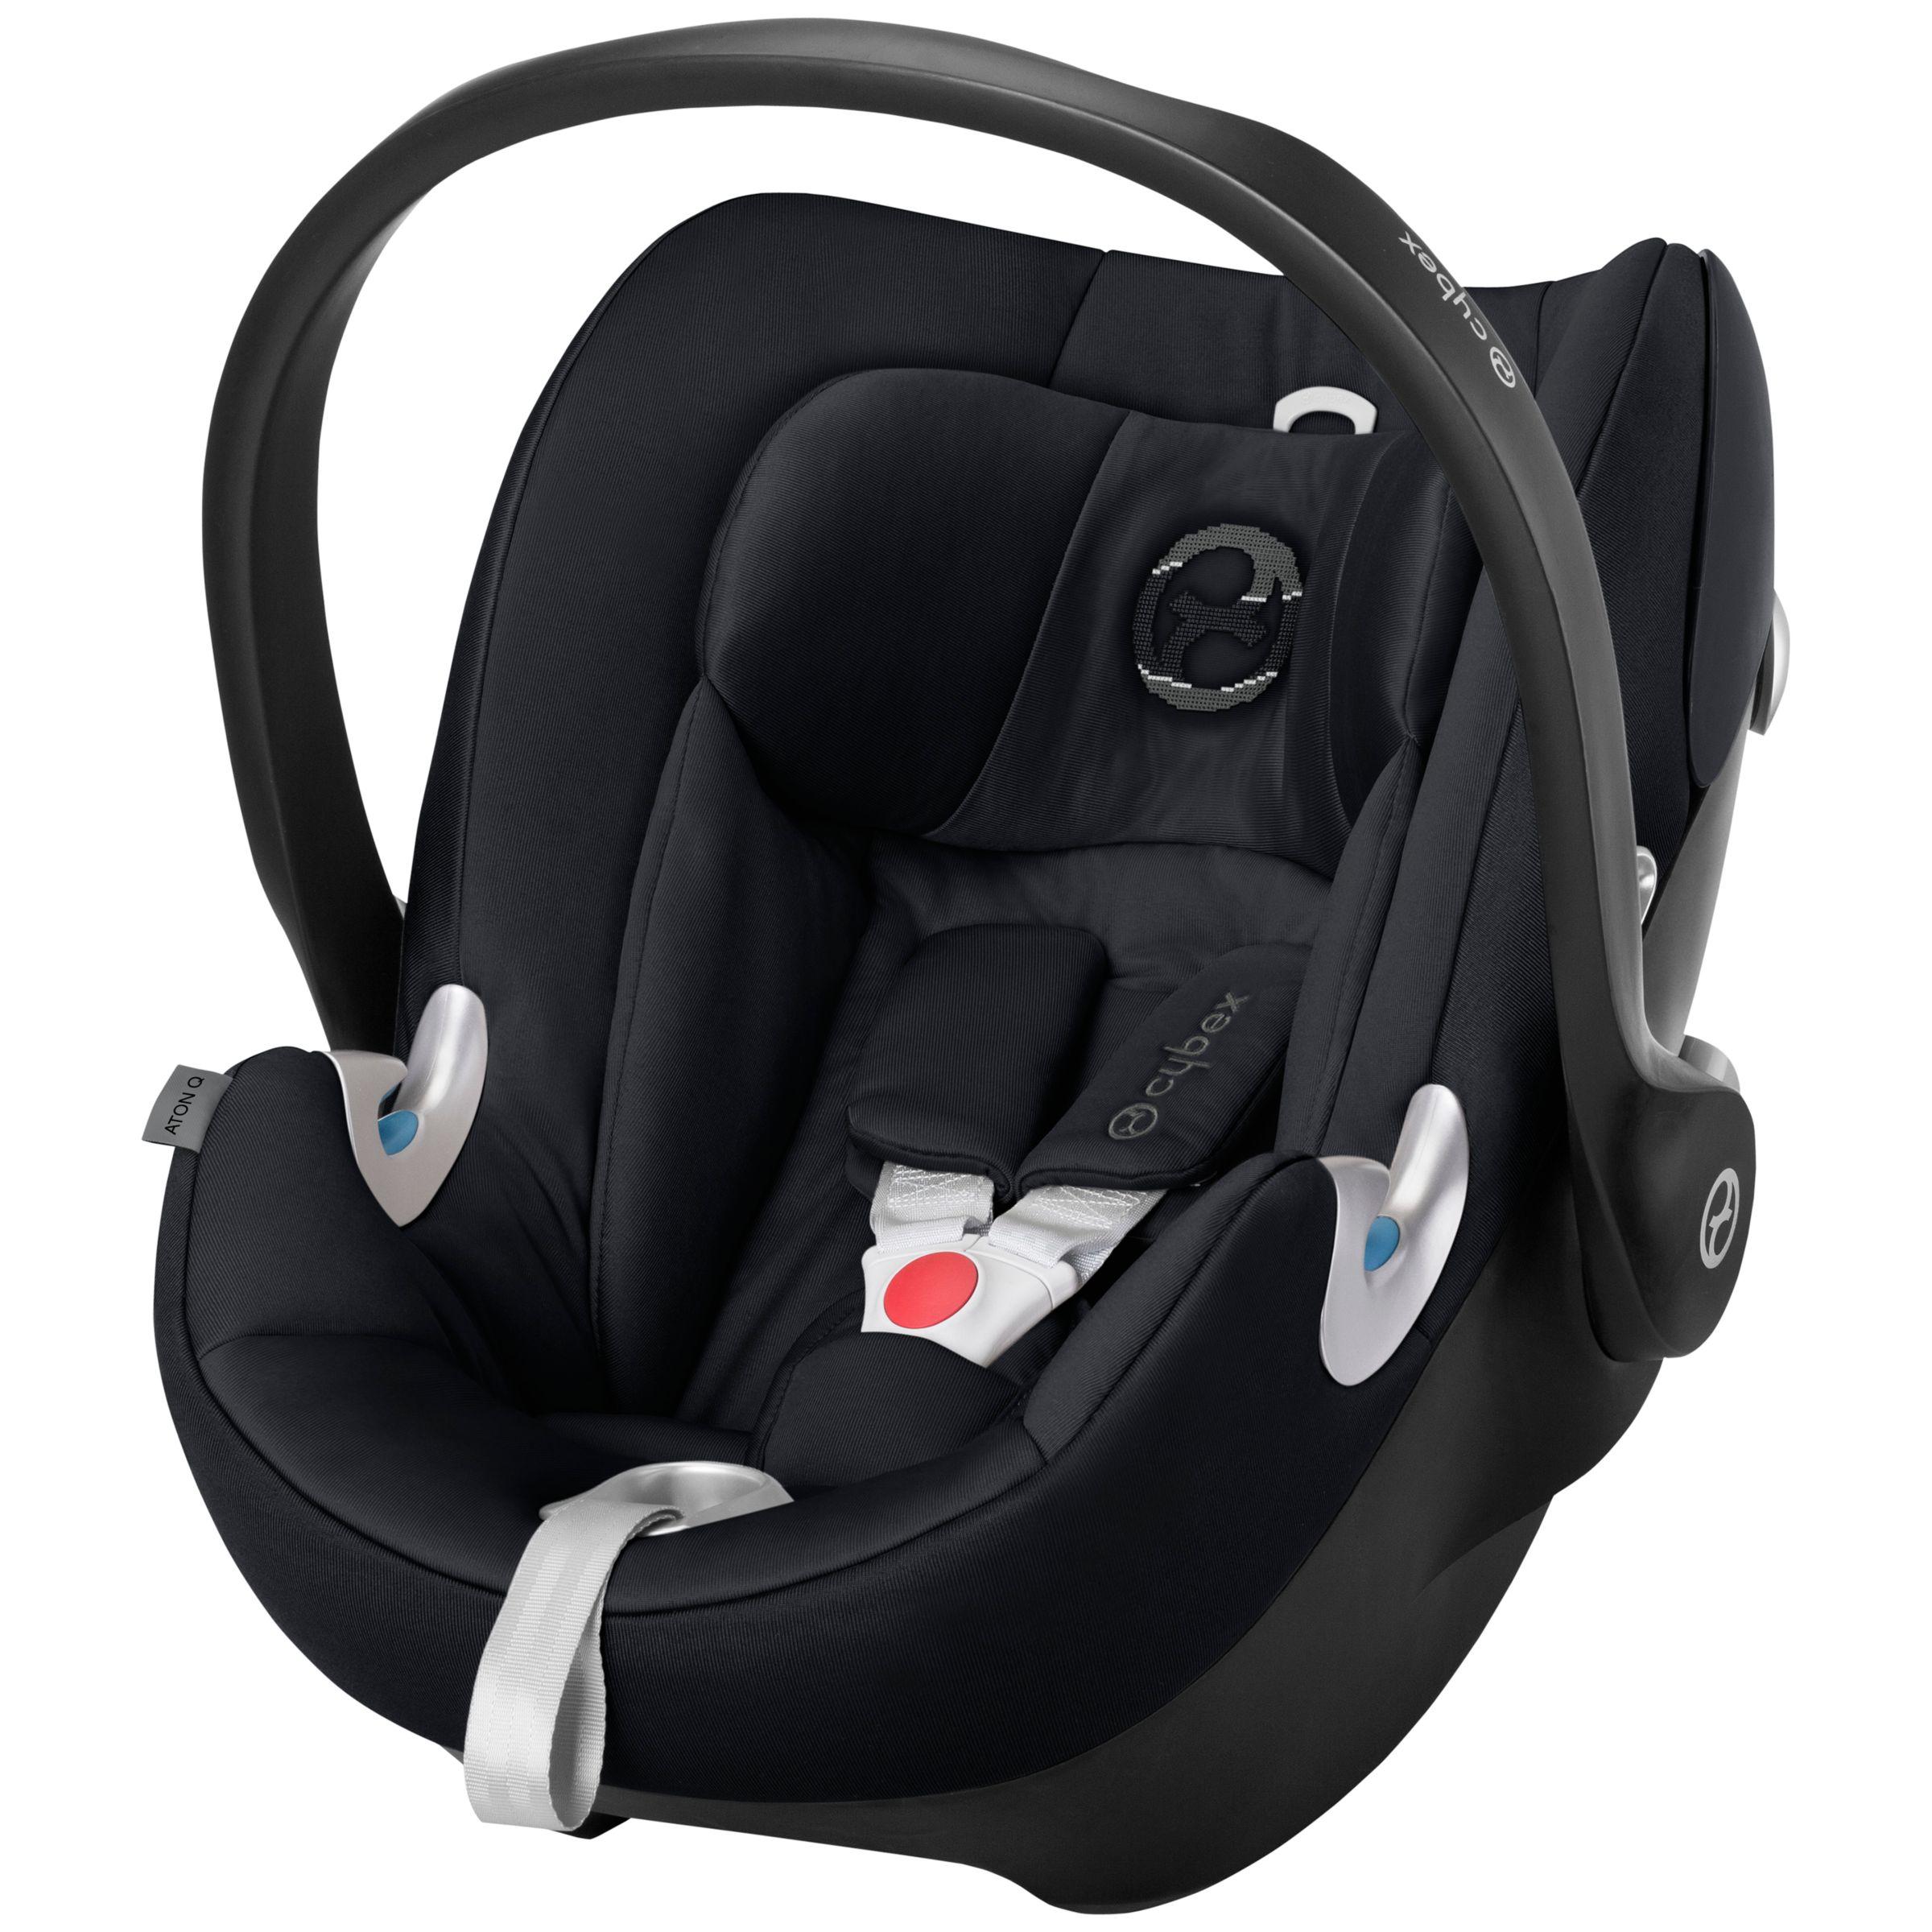 Cybex Cybex Aton Q Group 0+ Baby Car Seat, Stardust Black